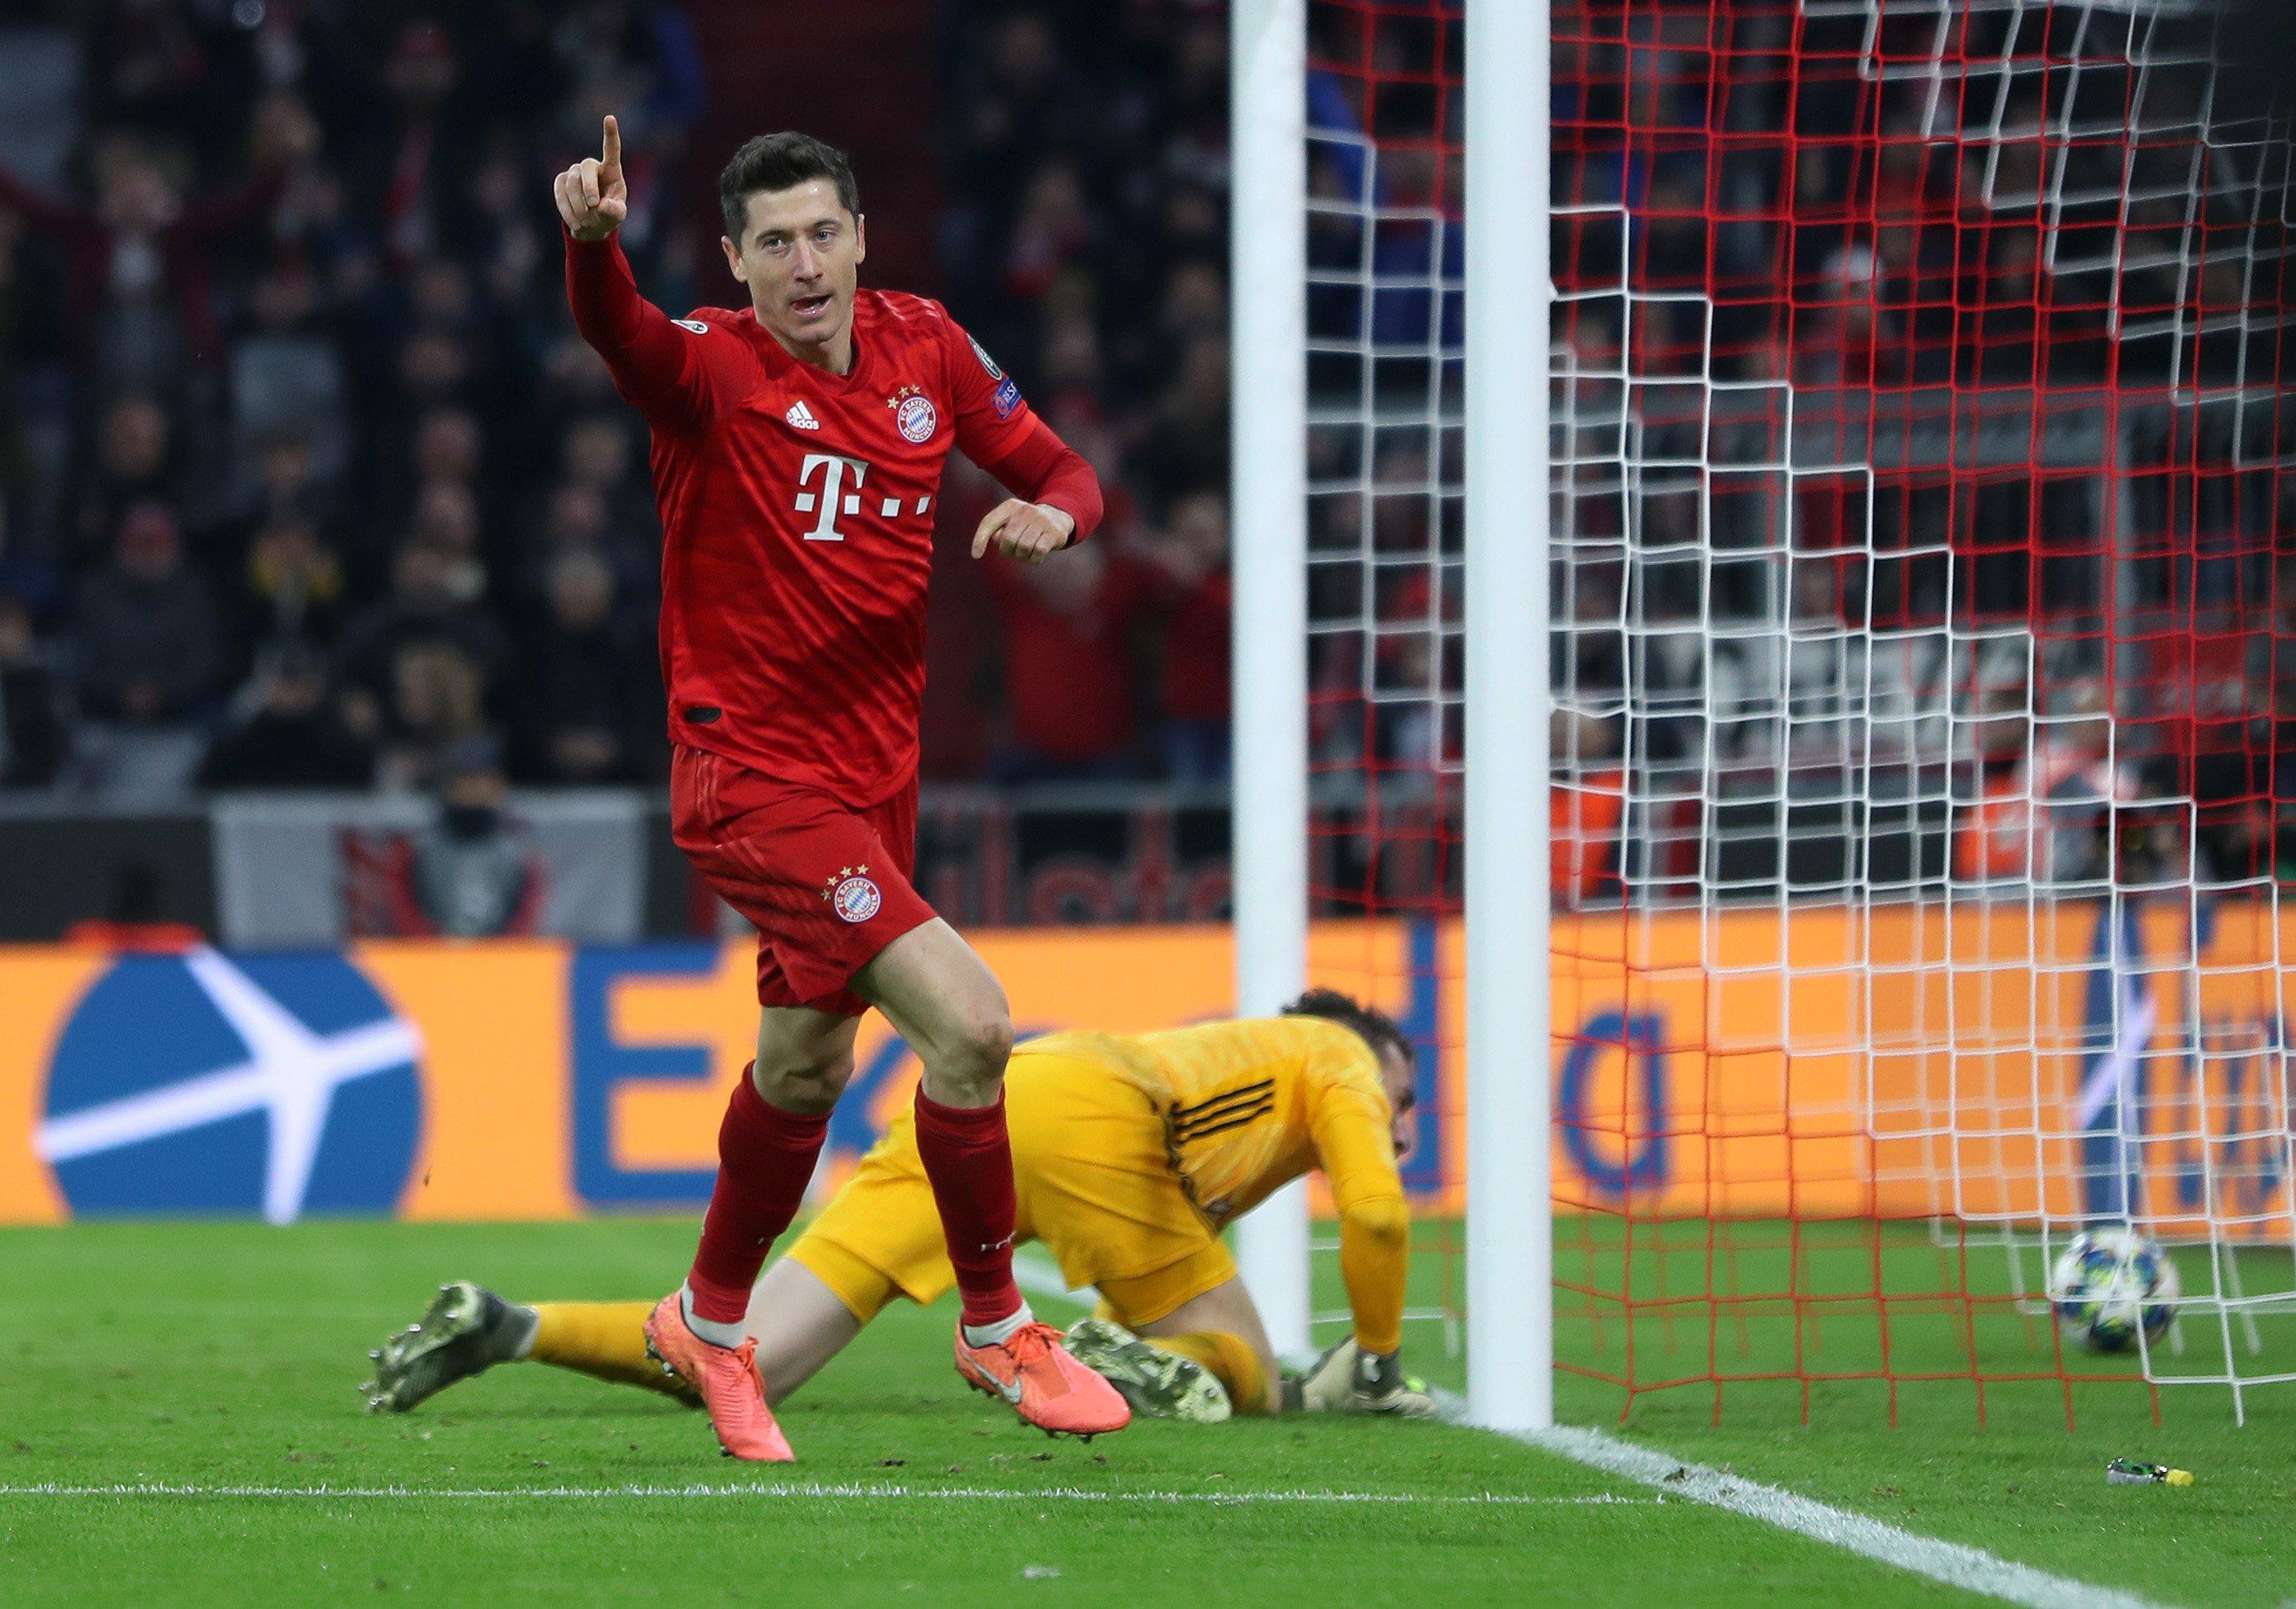 Liga šampiona: Bajern slomio otpor Olimpijakosa, Juventus do pobjede u nadoknadi